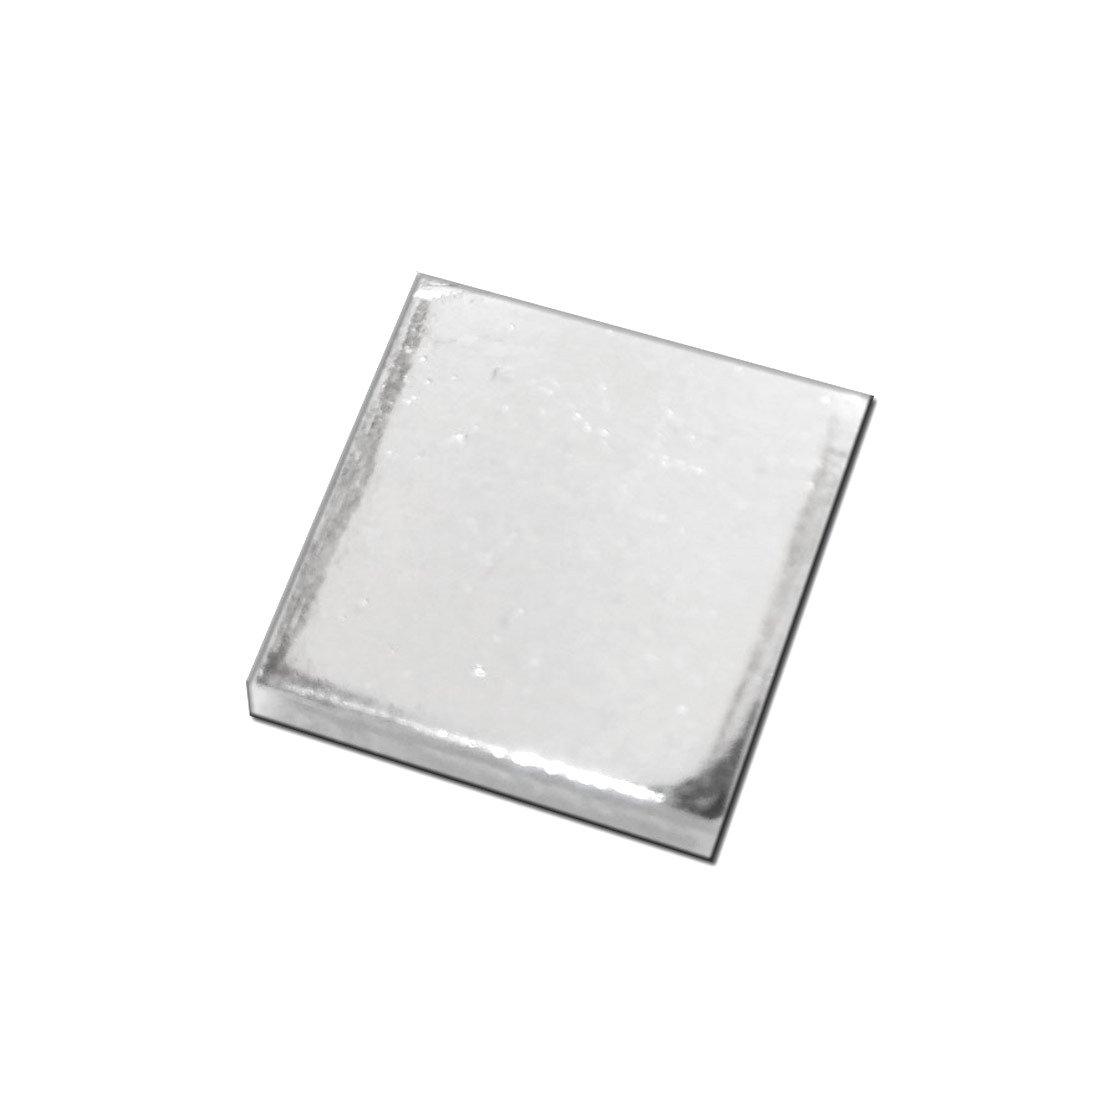 Karizma Jewels 999 Pure Silver Square piece of Silver Chandi ka Tukra Chokor